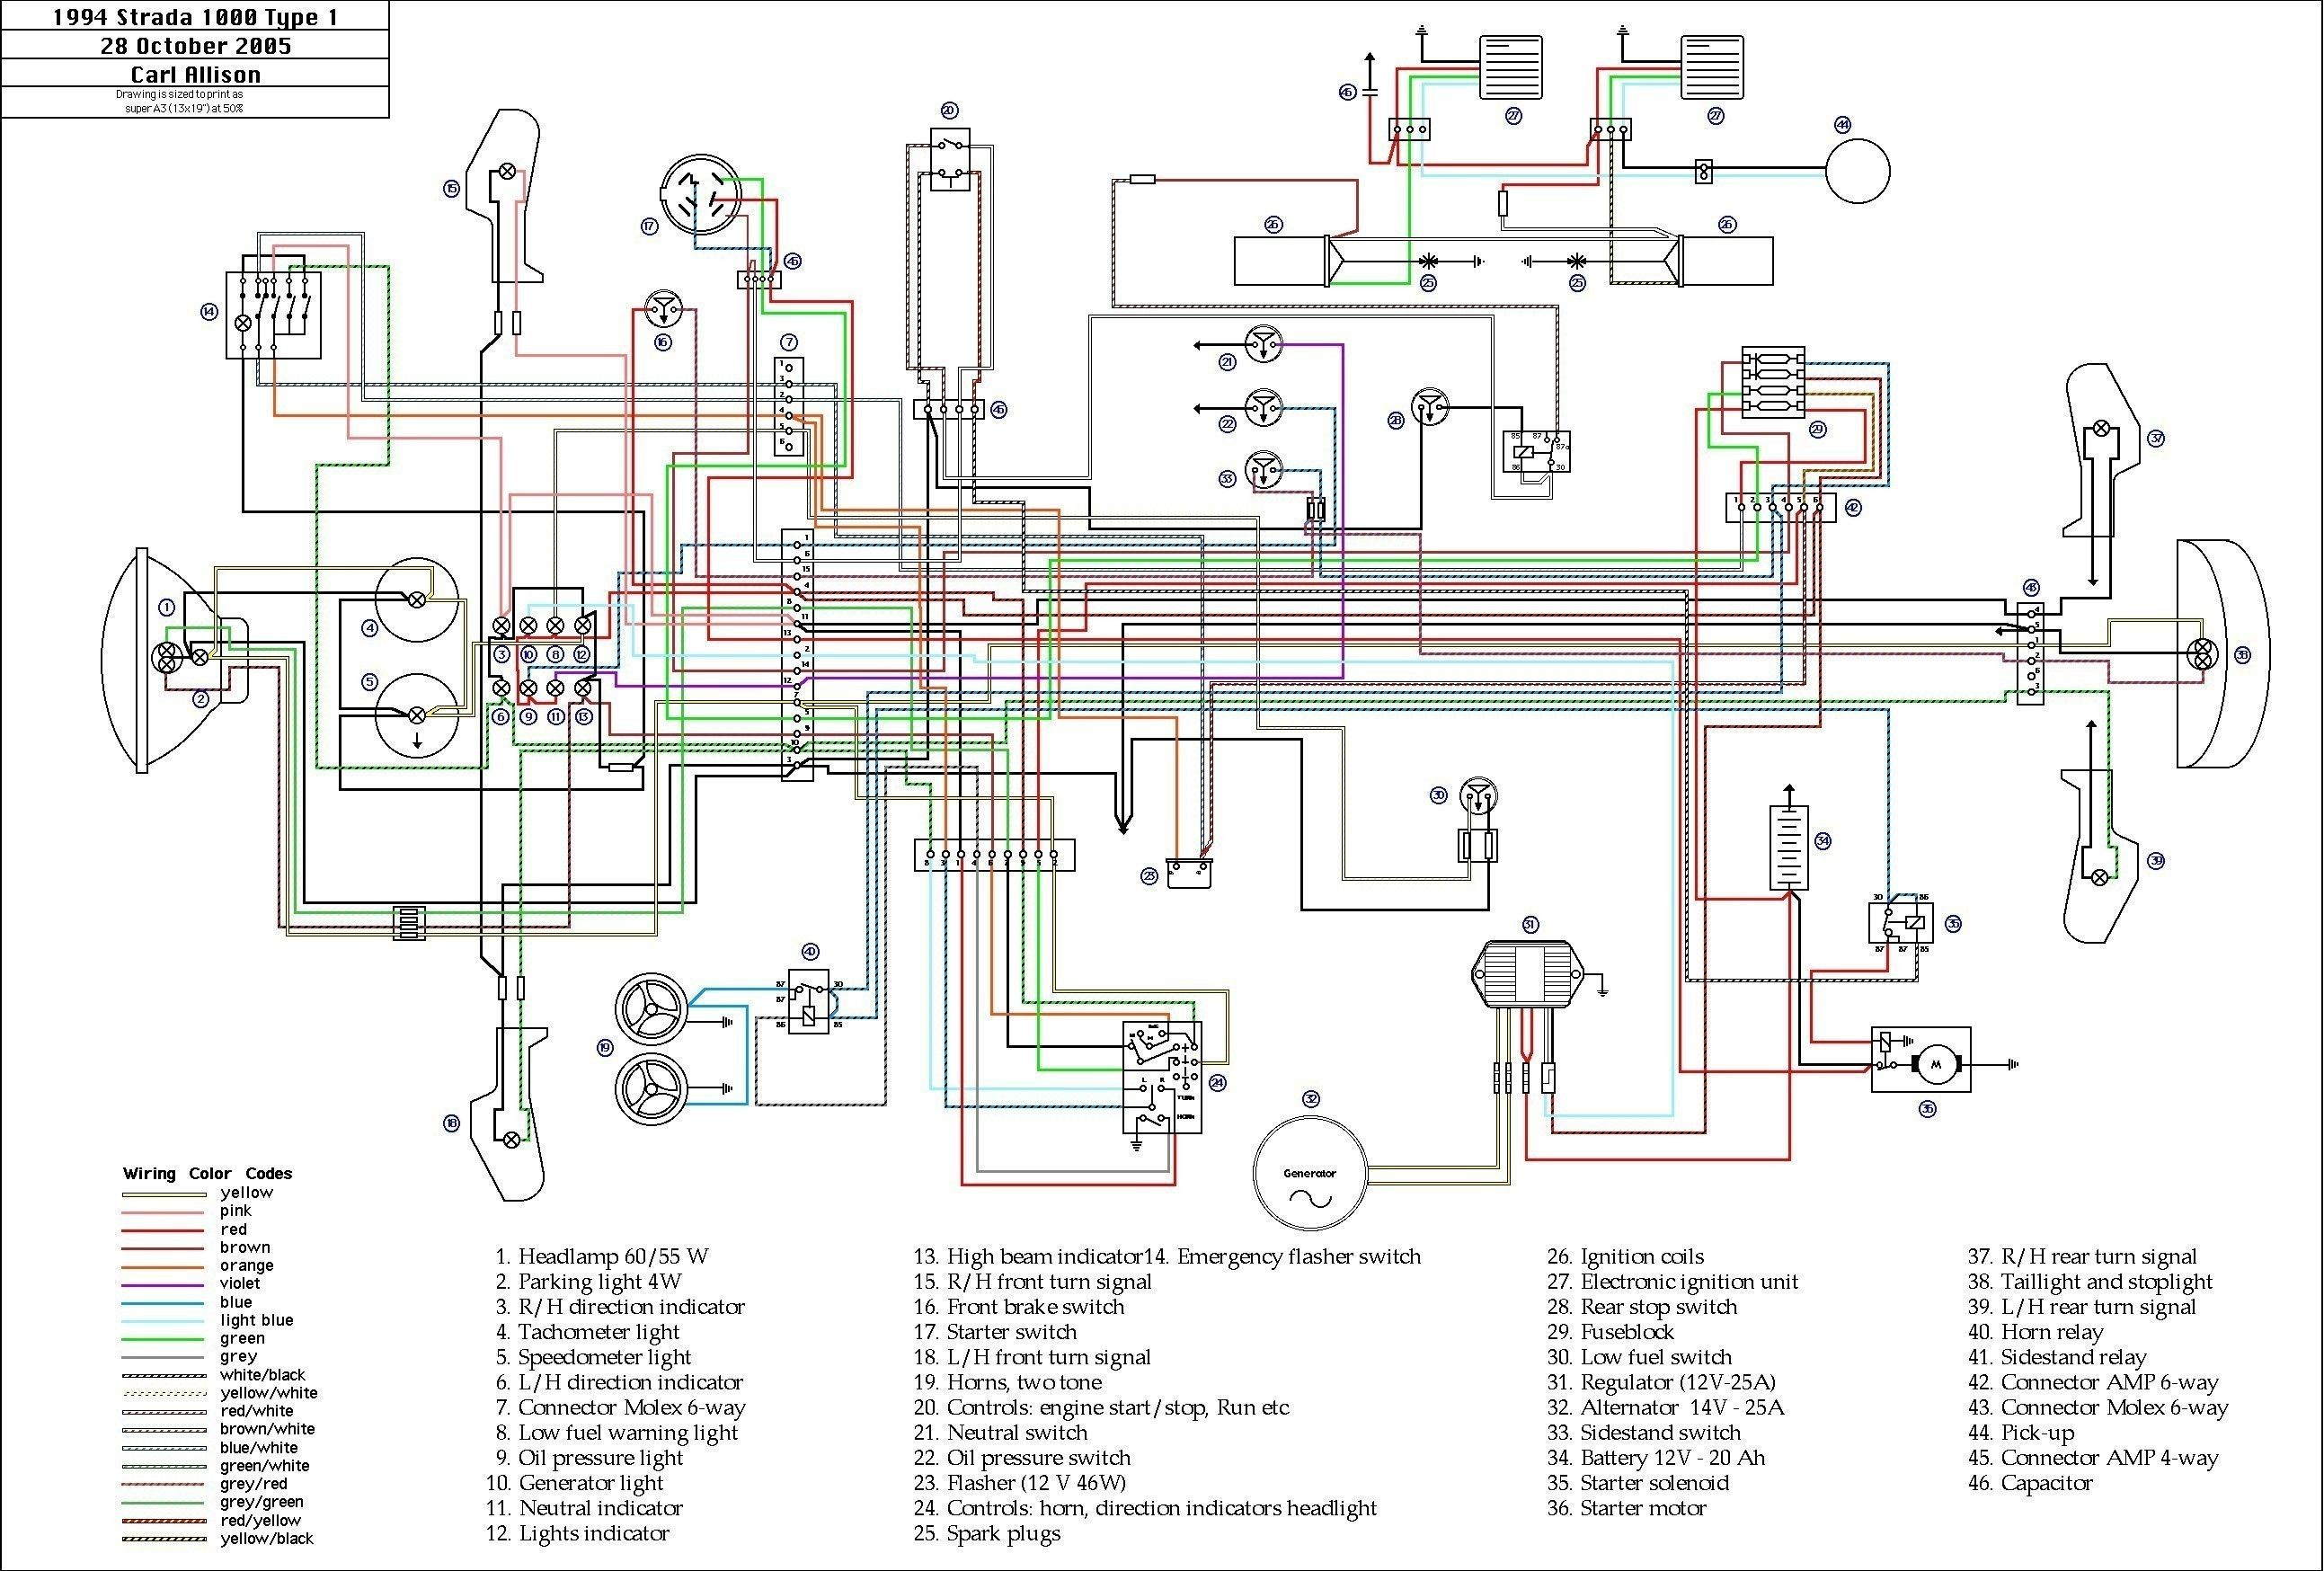 Alternator Warning Light Wiring   schematic and wiring diagram ...